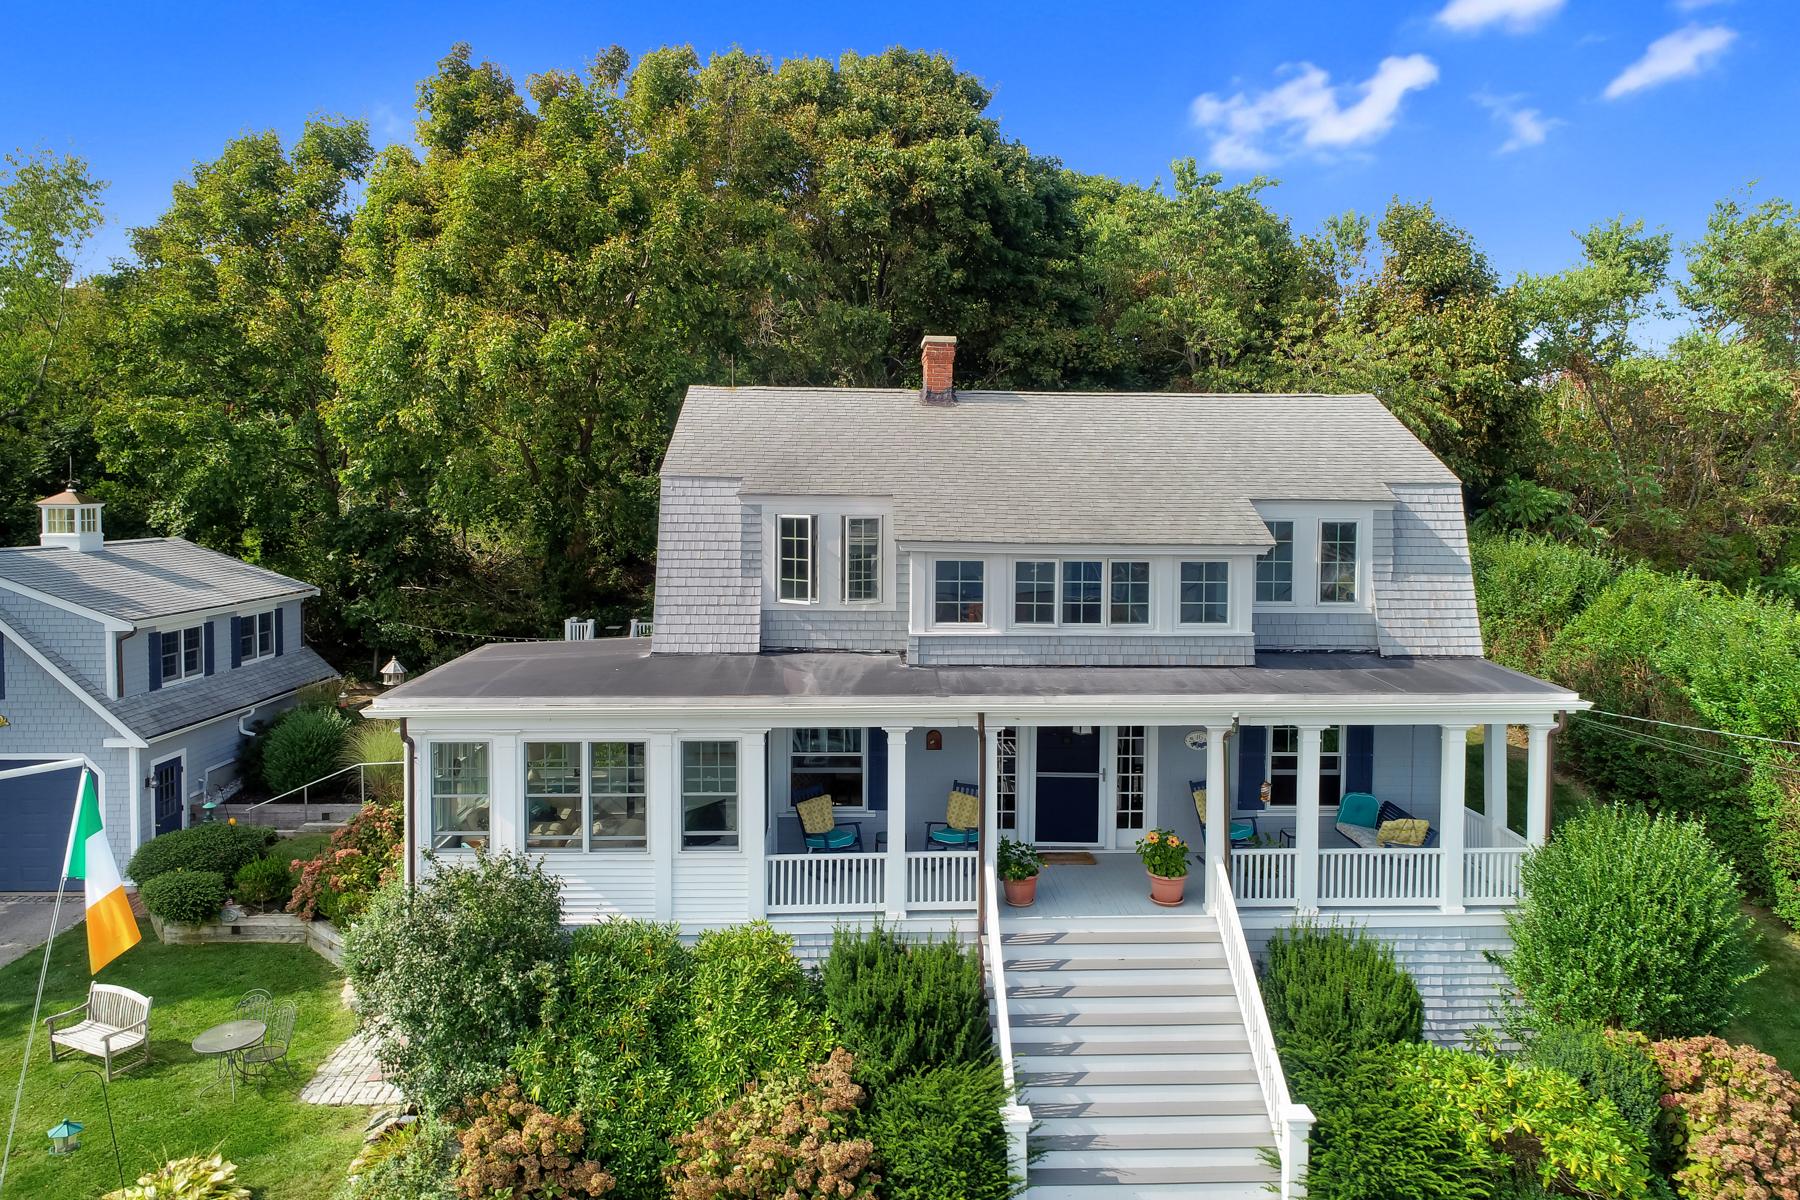 Single Family Homes for Sale at 16 Douglas Avenue 16 Douglas Ave Hull, Massachusetts 02045 United States